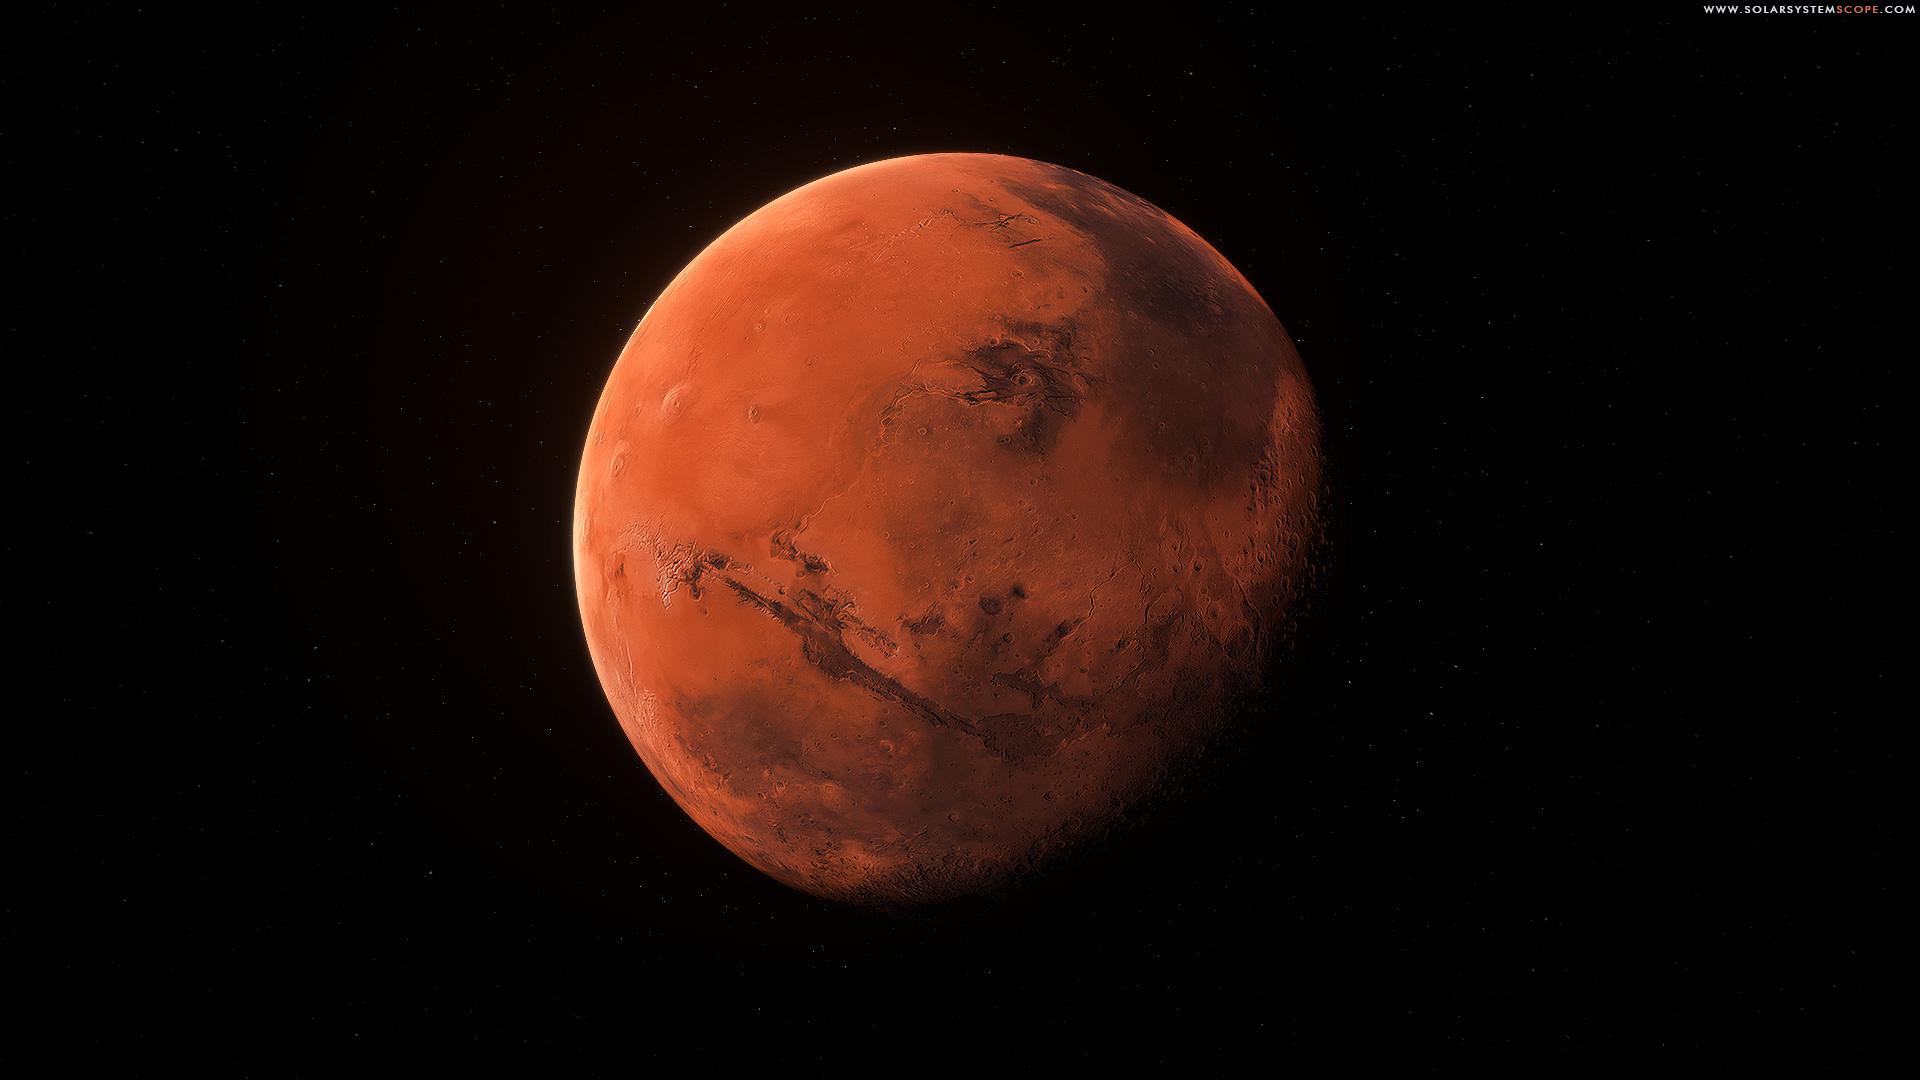 planet mars hd 1080p - photo #1